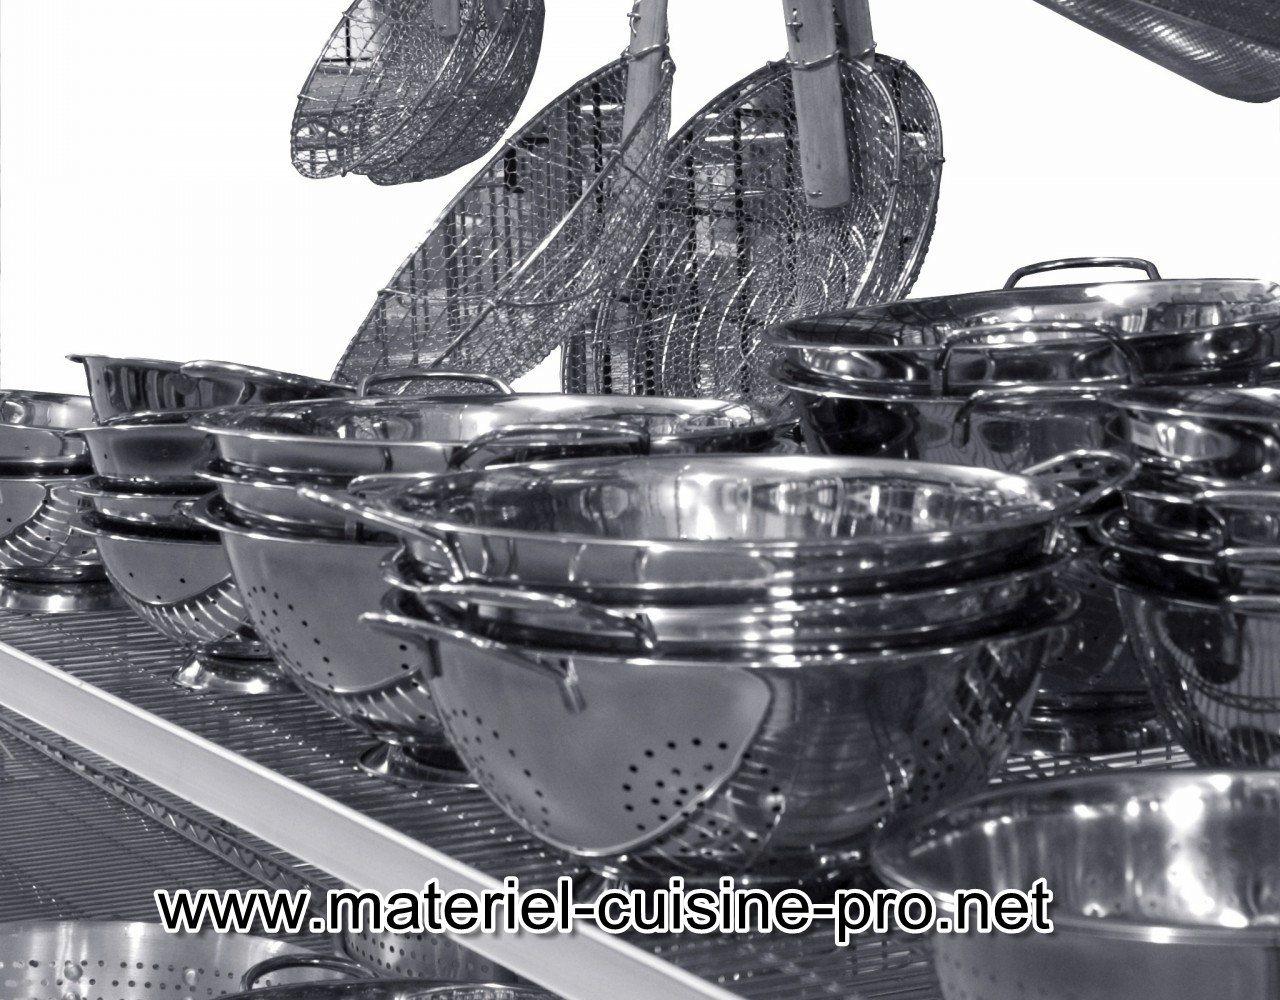 khouribga mat riel et quipement de caf et restaurant cuisine pro mat ri. Black Bedroom Furniture Sets. Home Design Ideas